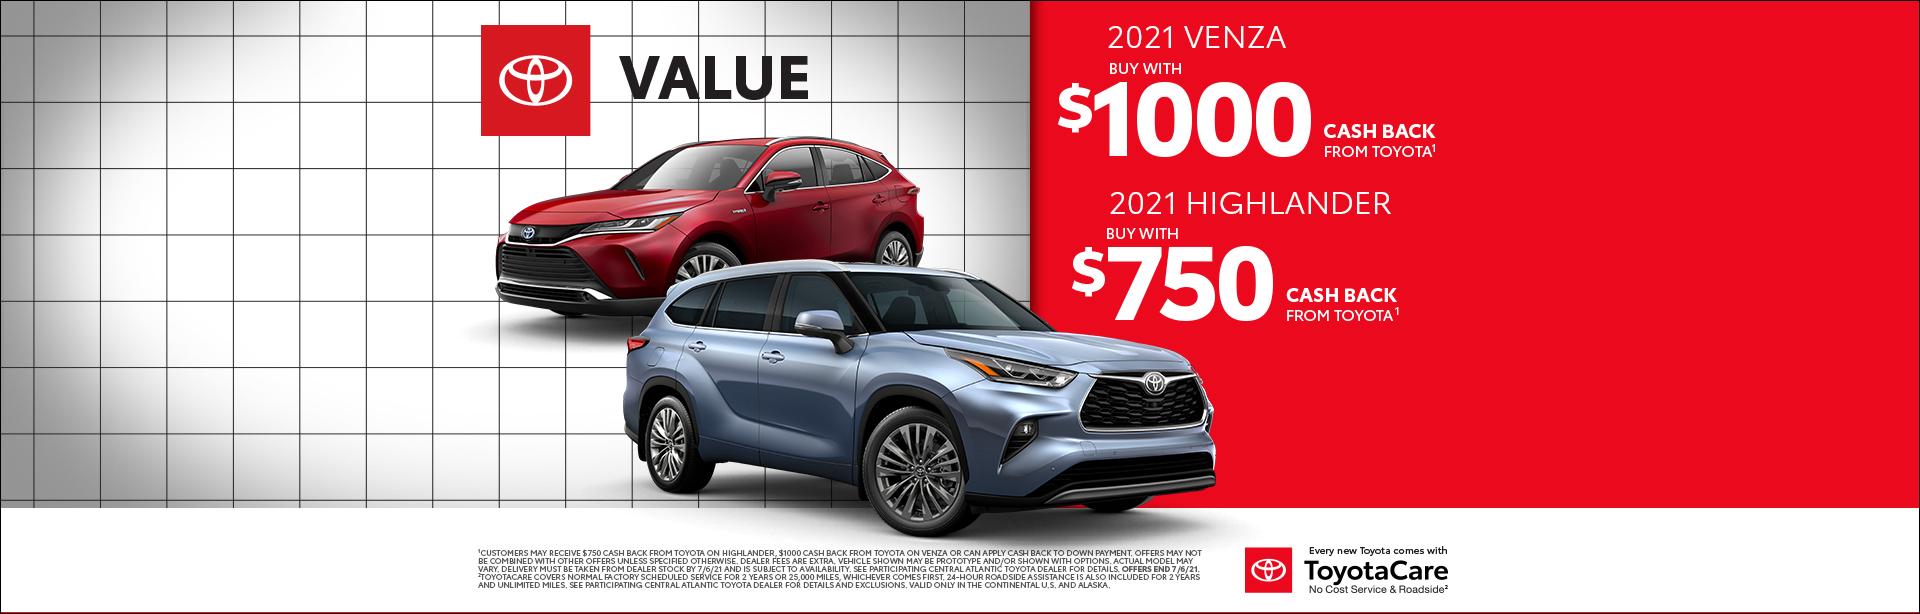 06-21_01_Central-Atlantic-Toyota-June-2021-CAT-Toyota-Care---Highlander---Venza_1920x614_36bc_Highlander-Venza_R_xta.jpeg